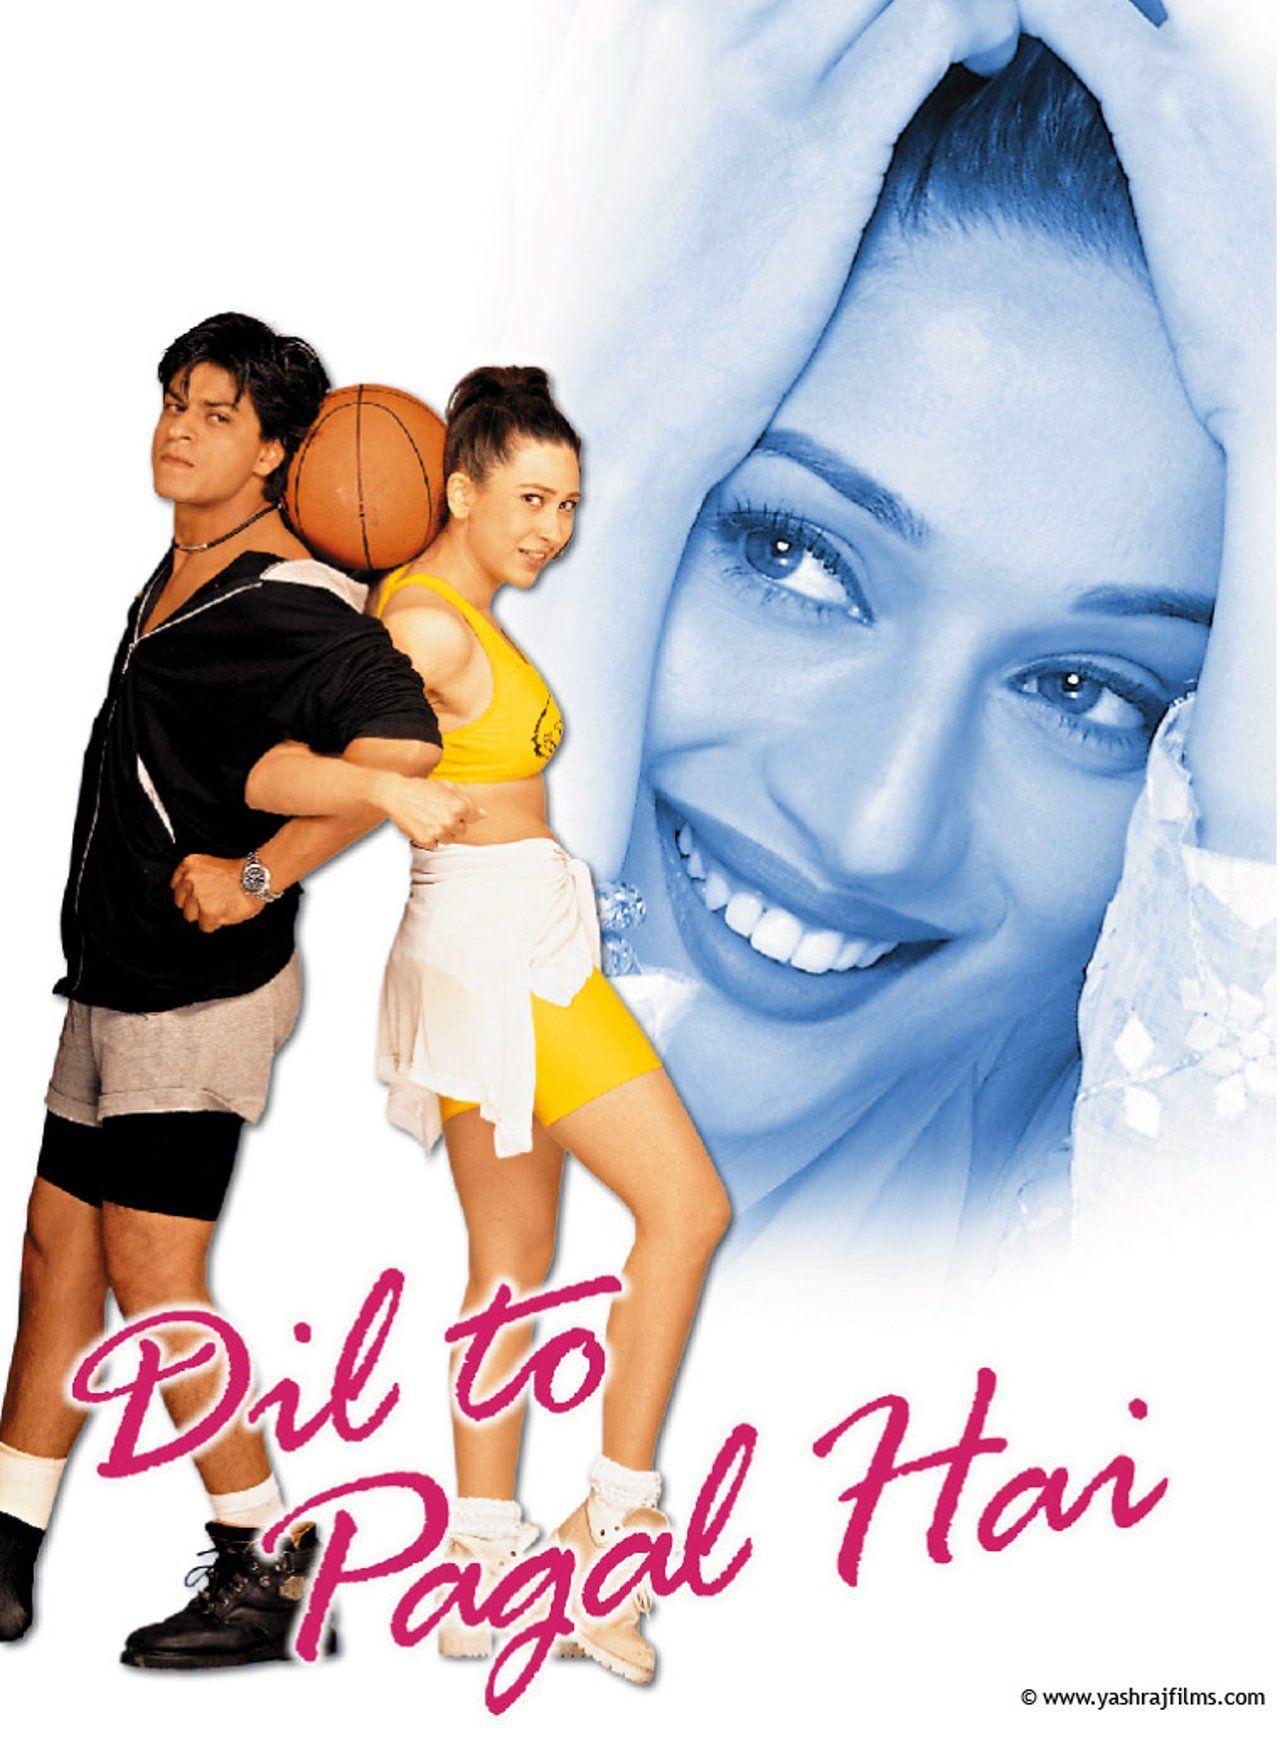 Dil to Pagal Hai - DVD plast